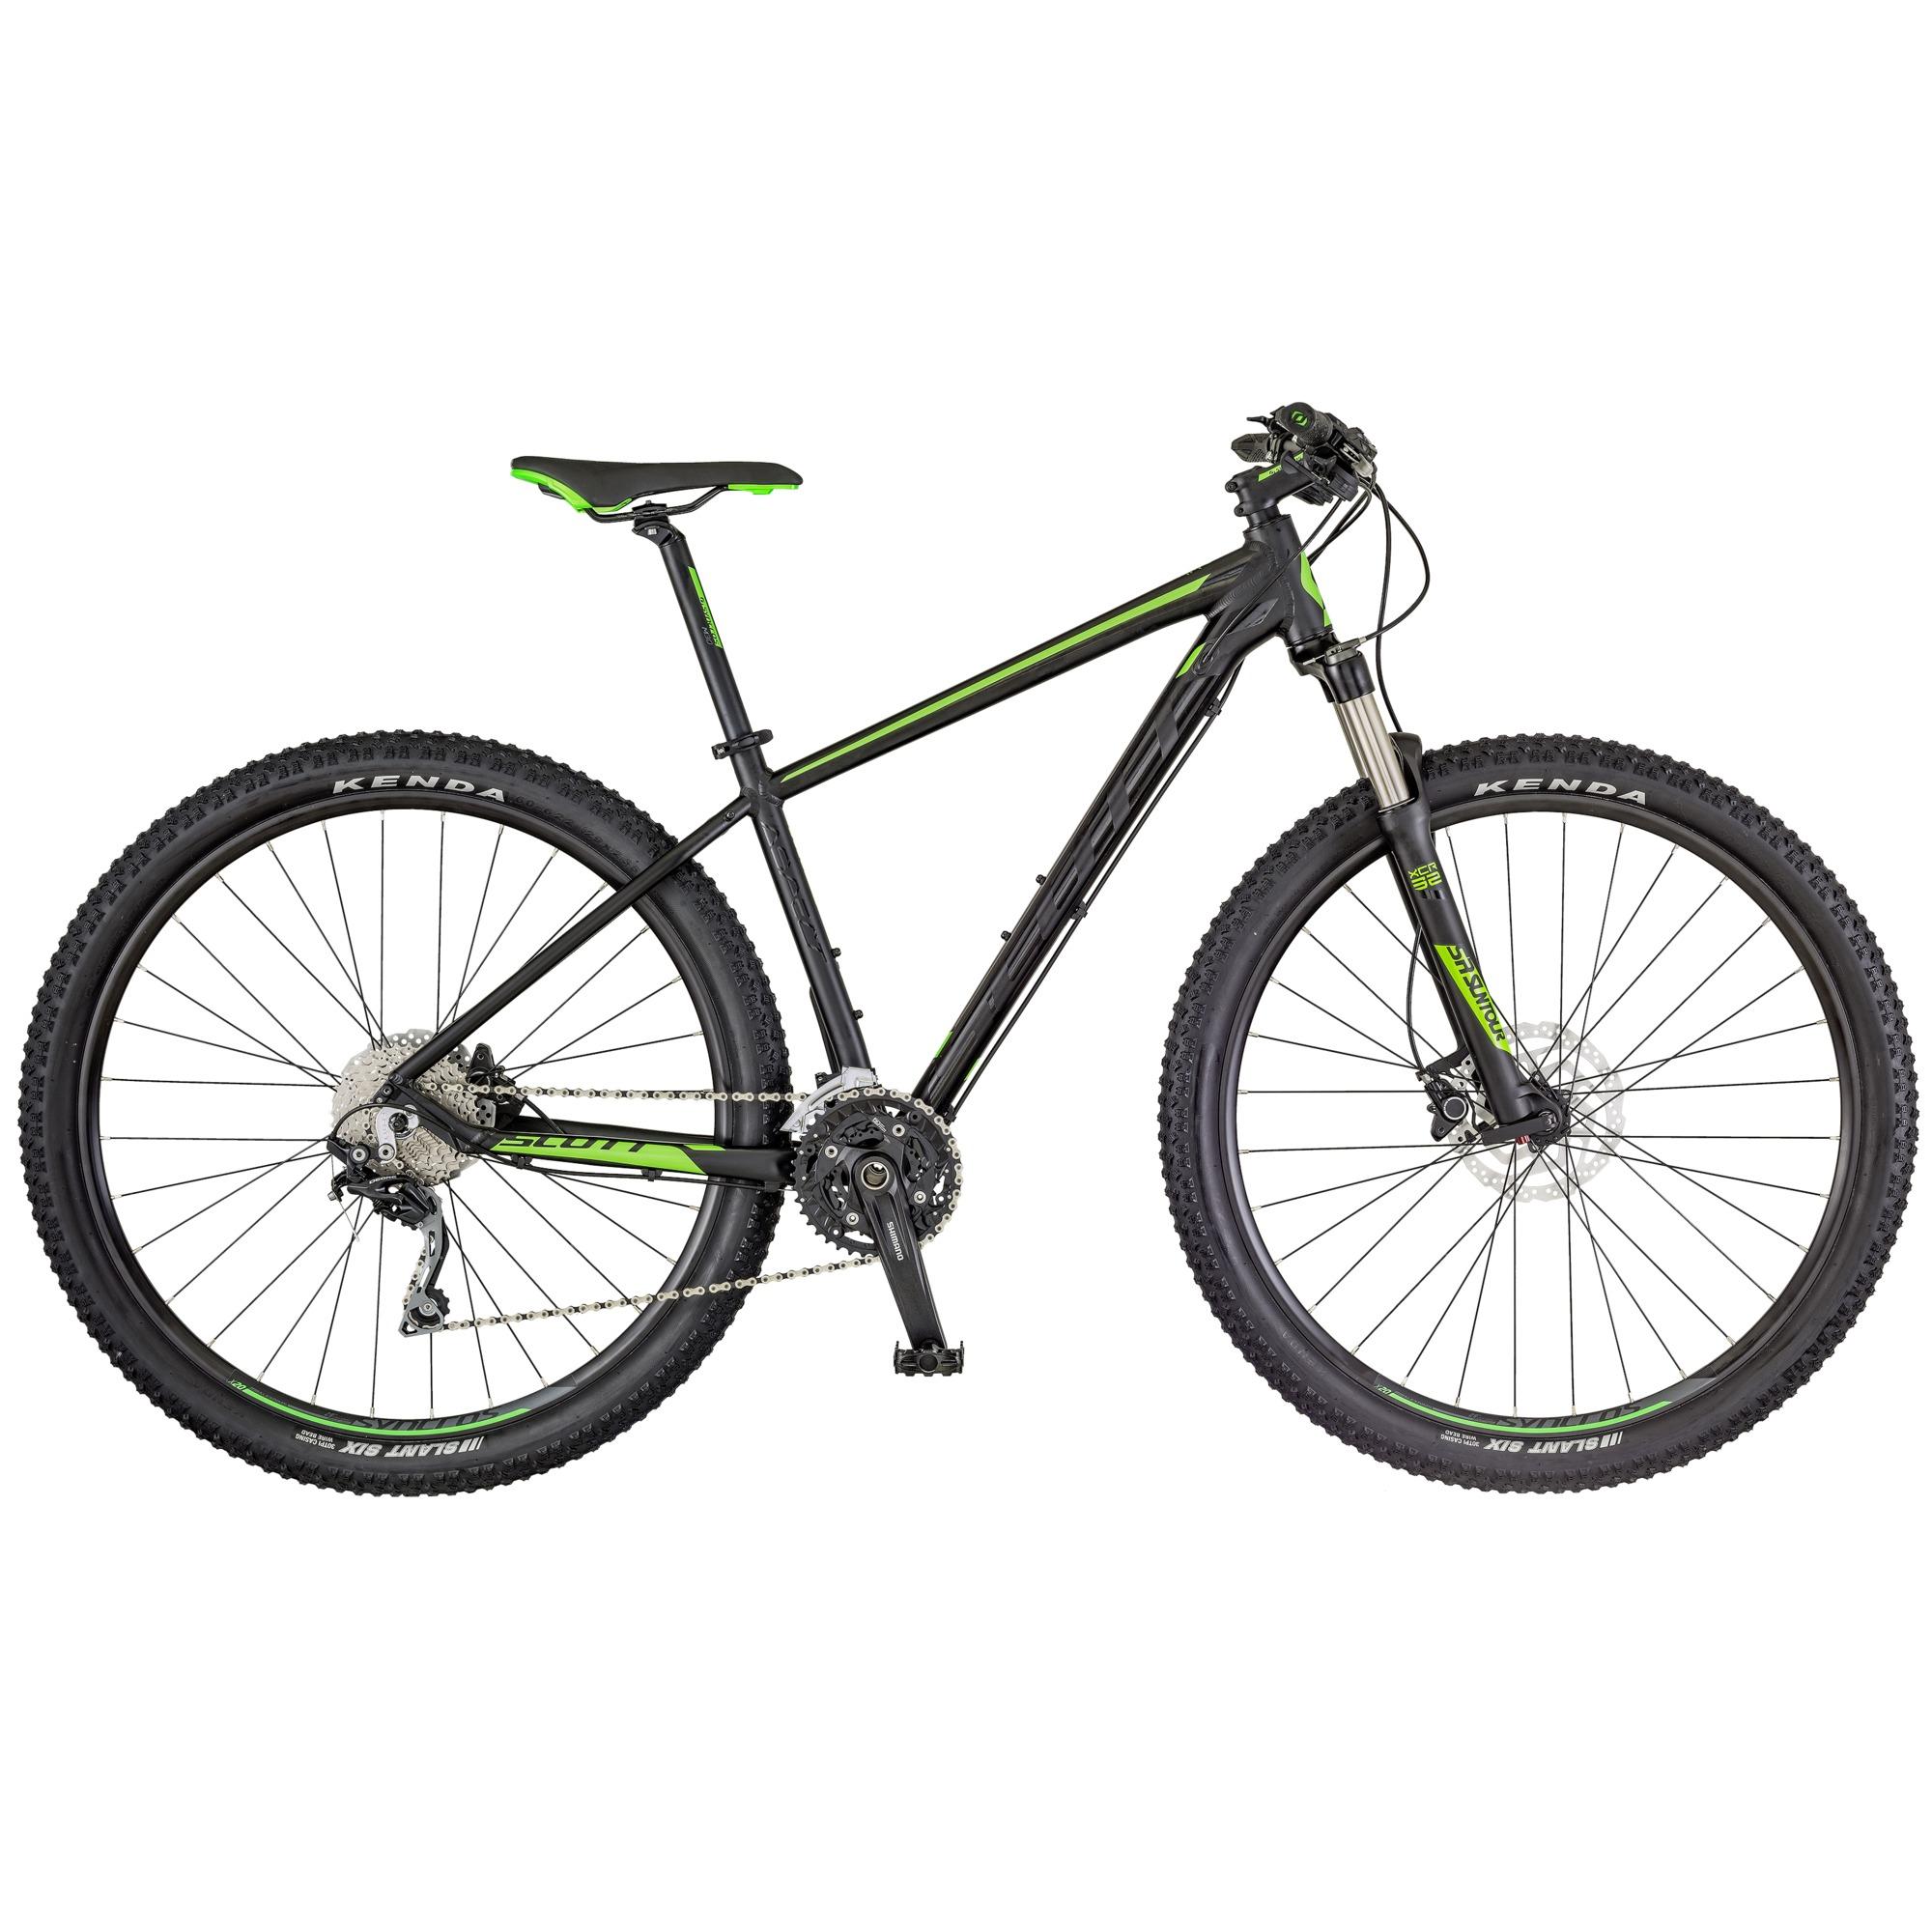 SCOTT Aspect 720 Bike L - Zweirad Homann